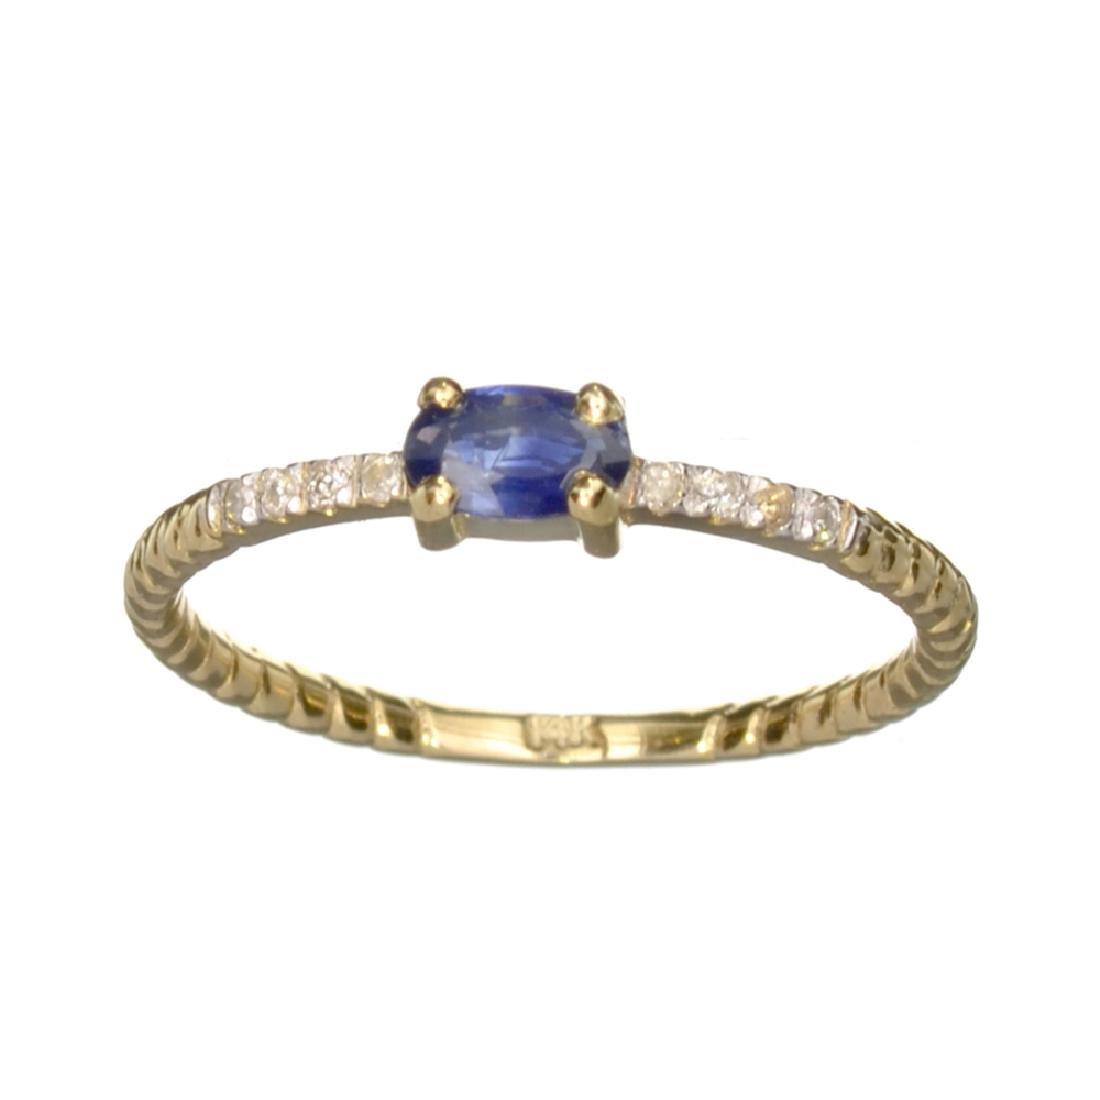 APP: 0.7k Fine Jewelry 14 KT Gold, 0.28CT Blue Sapphire